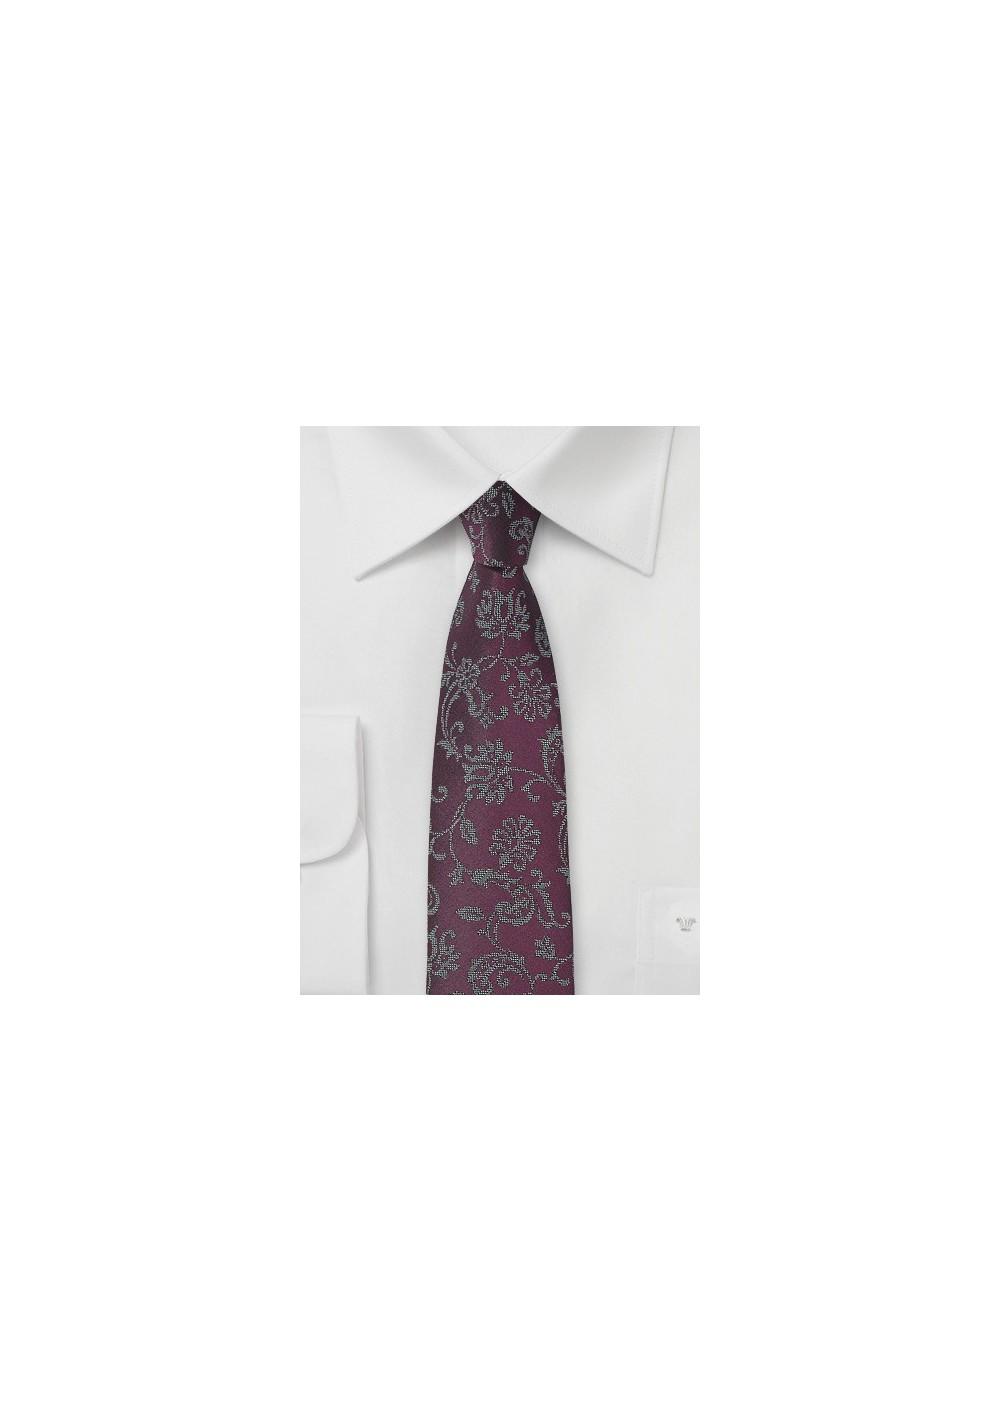 Plum Colored Floral Tie